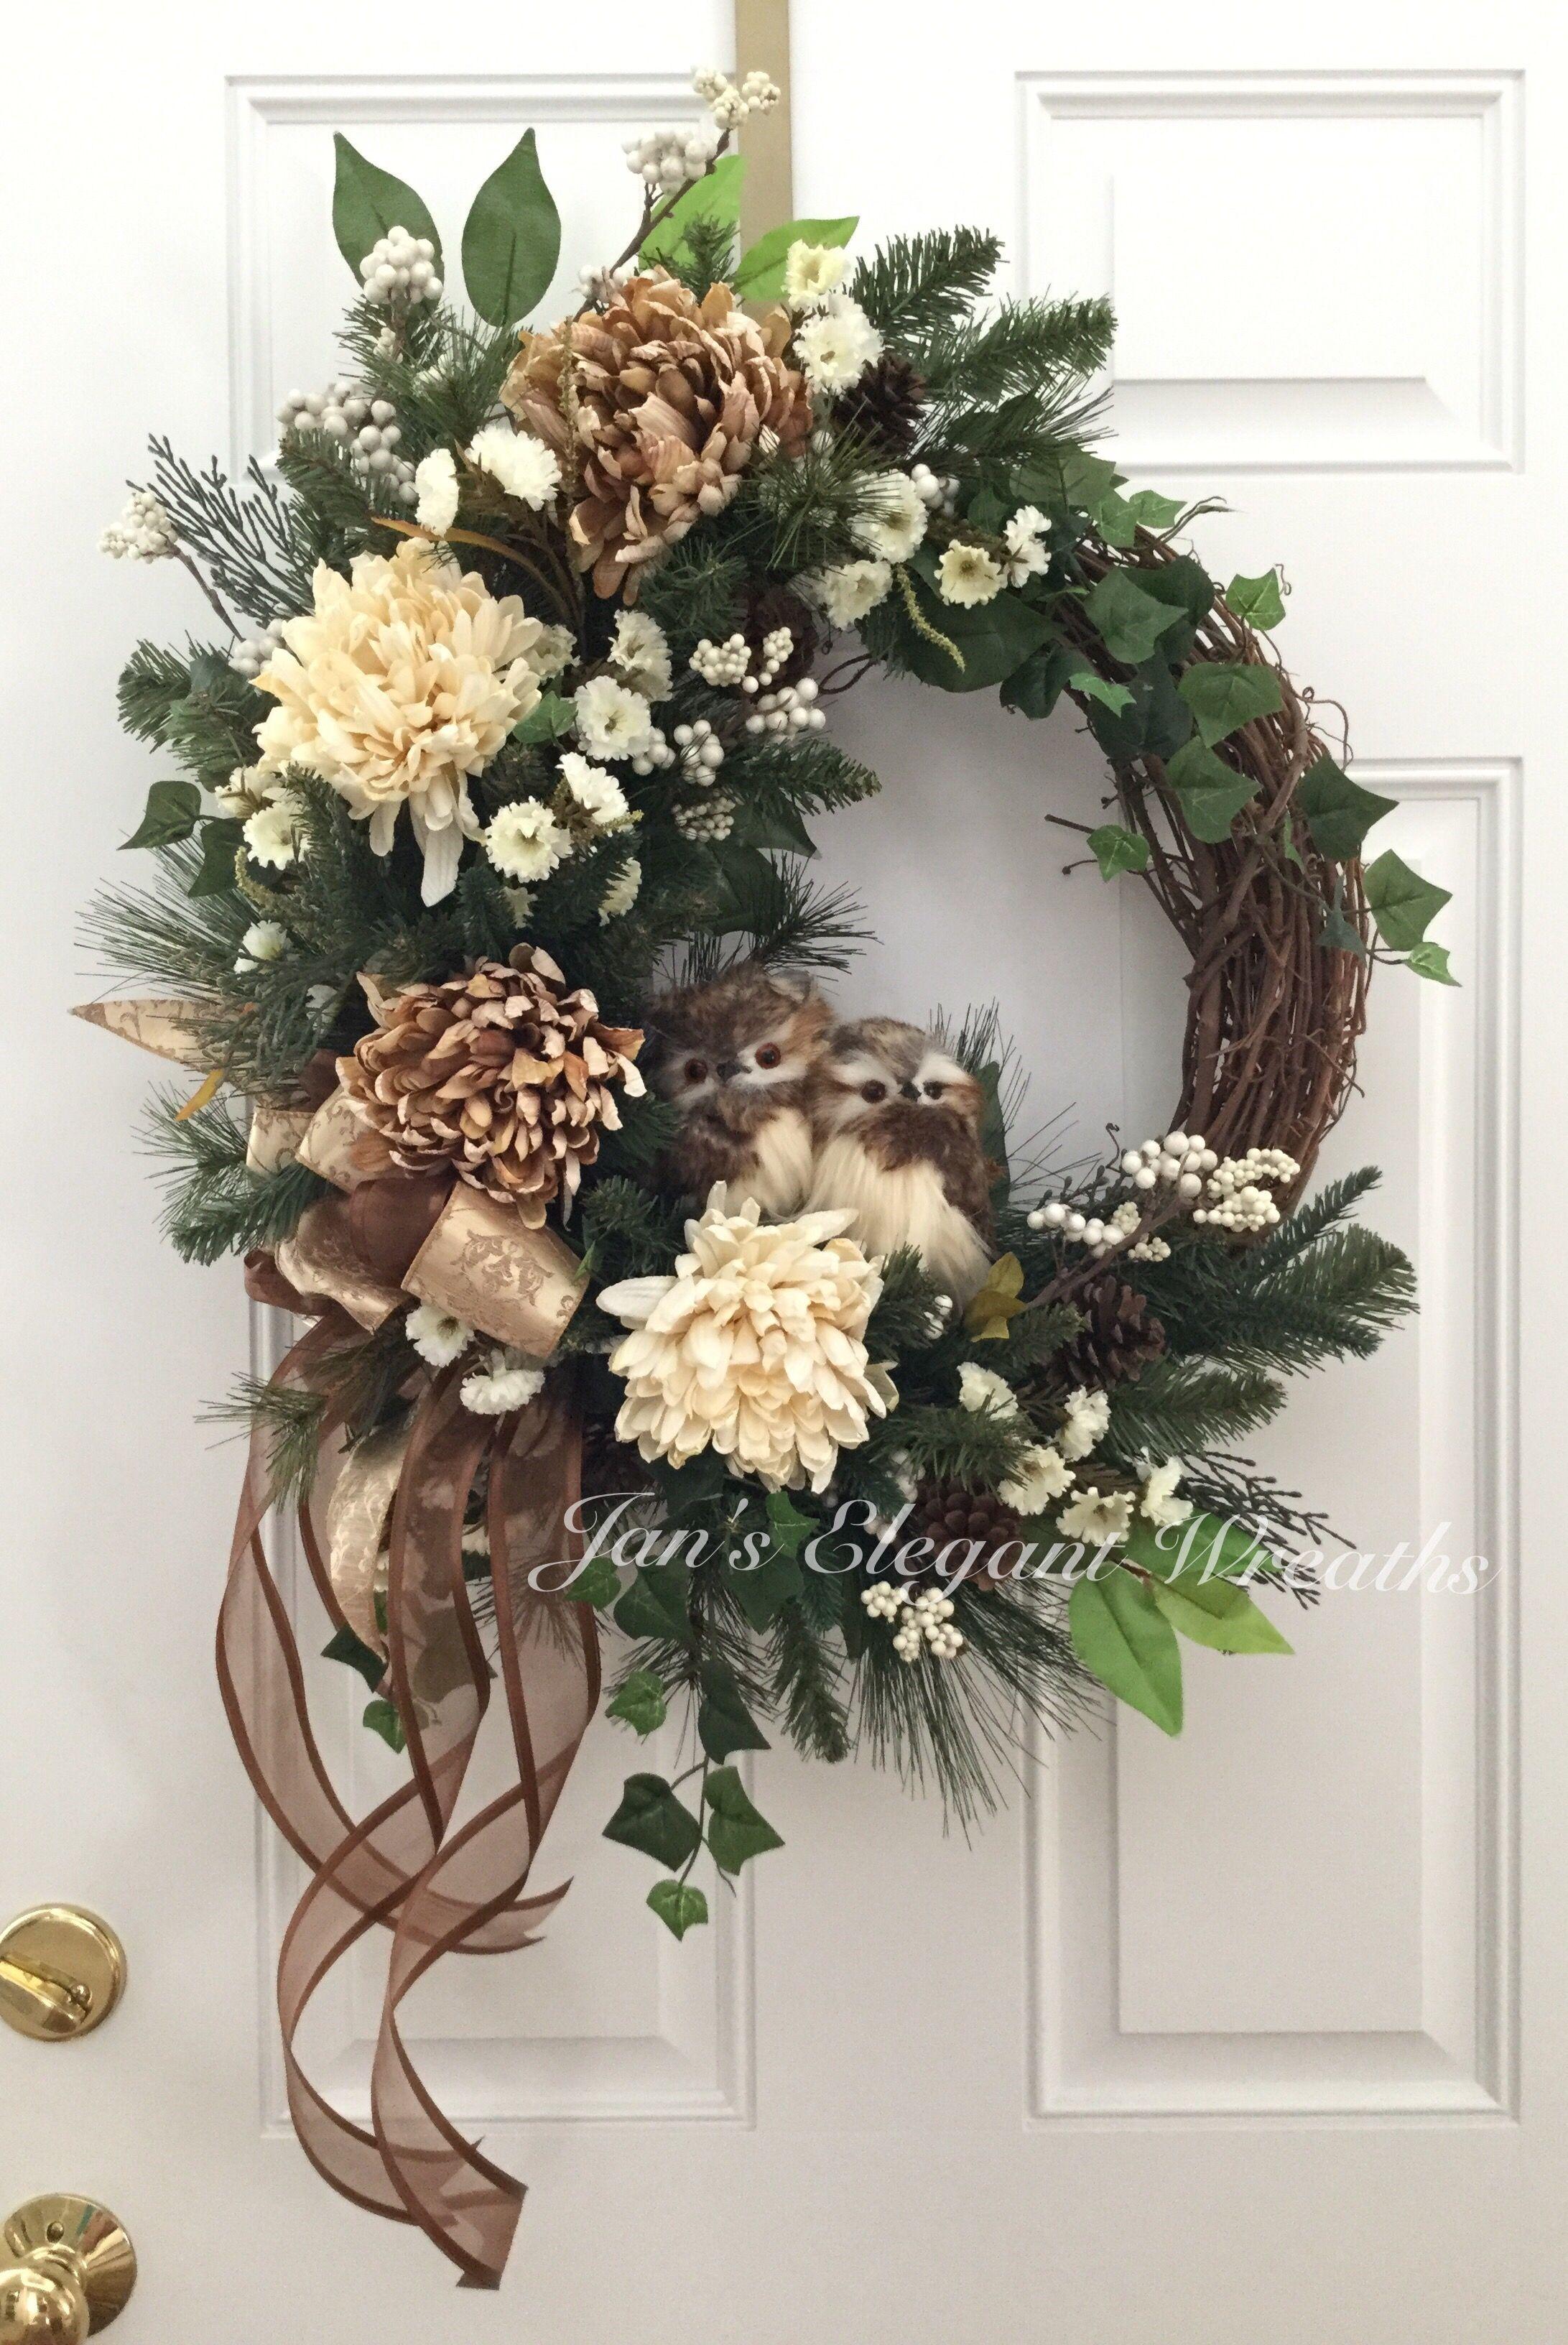 Pin by Jans Elegant Wreaths on Fall Winter Wreaths